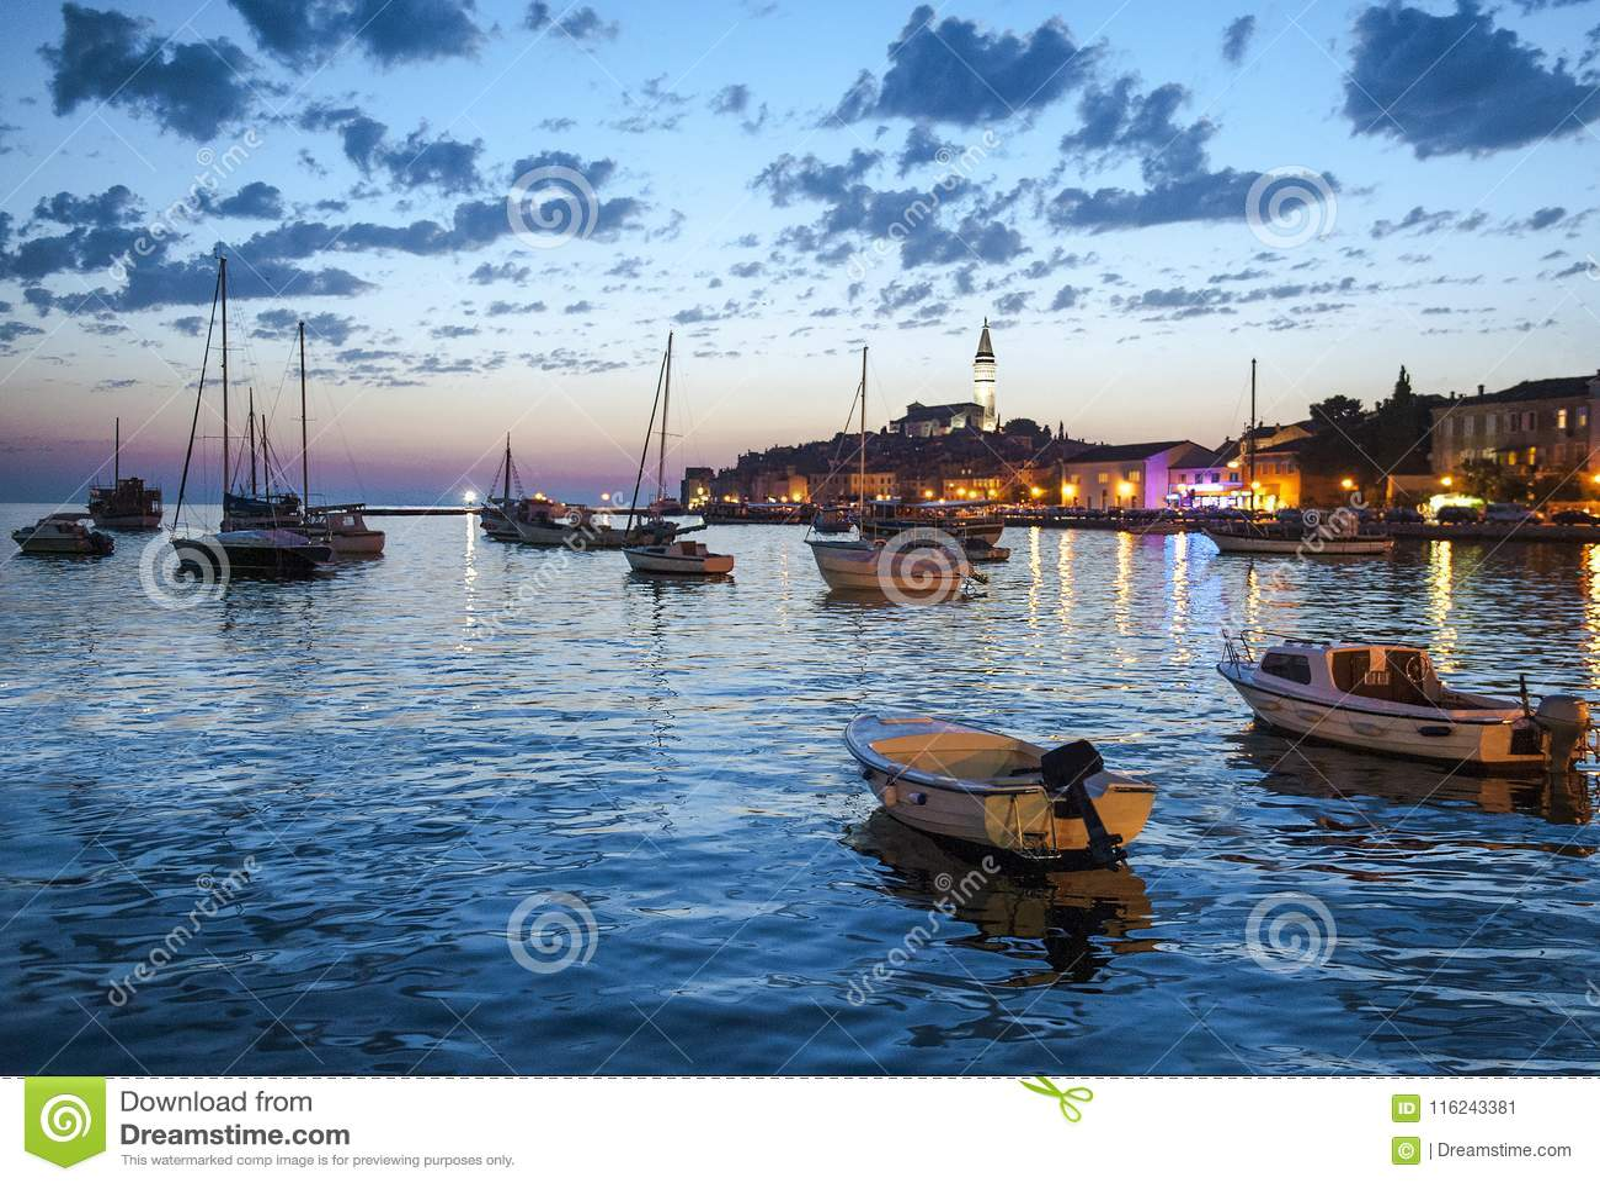 Night view of beautiful town Rovinj in Istria, Croatia. Evening in old Croatian city, night scene with water reflections